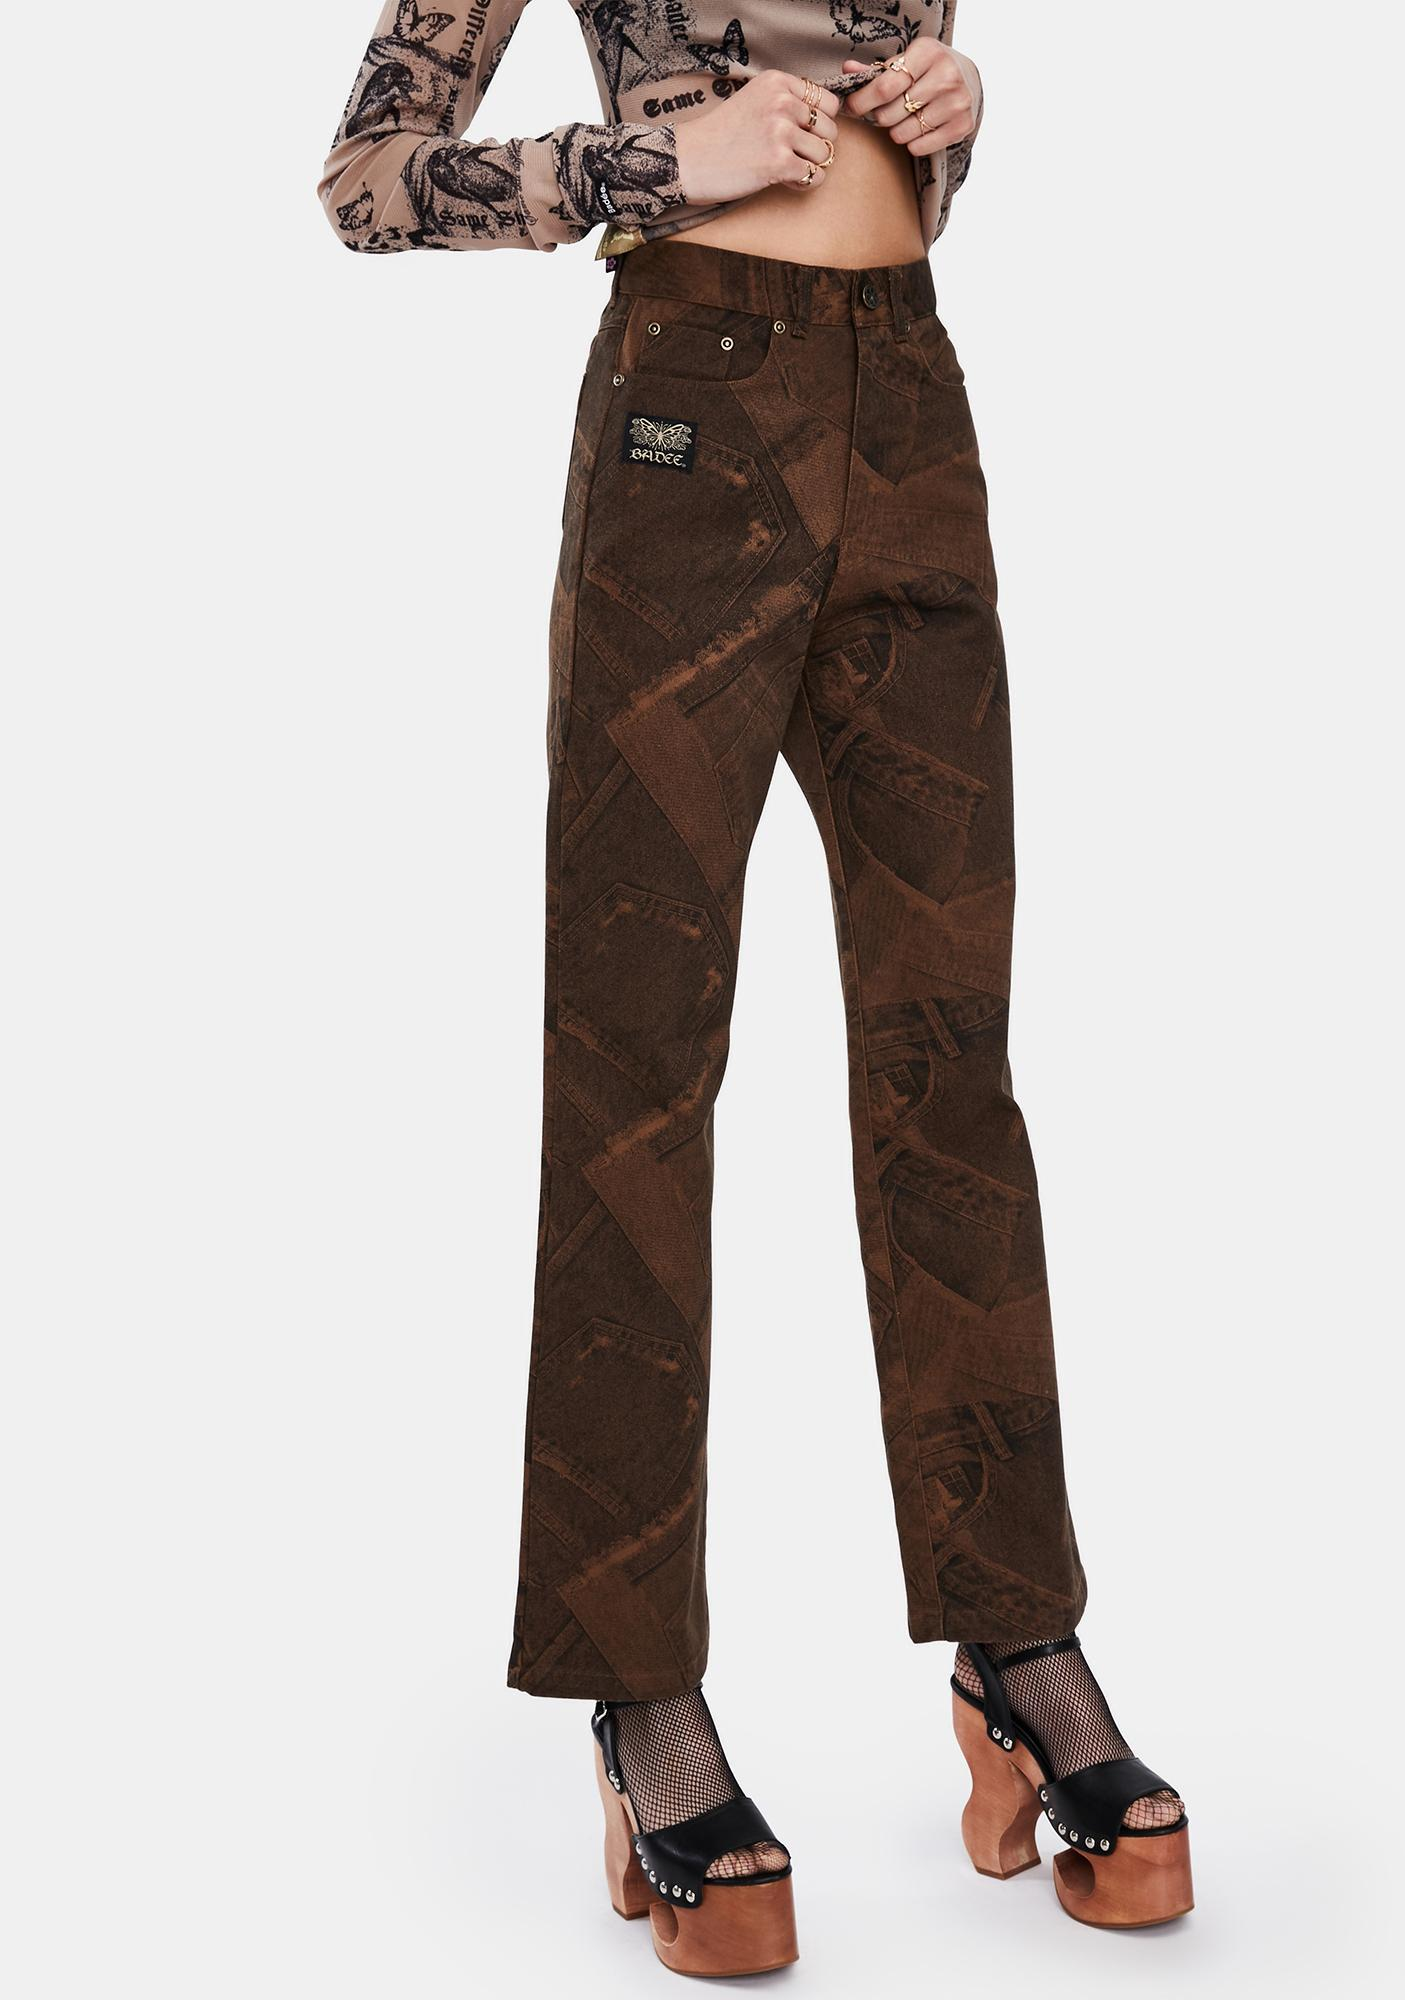 BADEE Patchwork Denim Pants